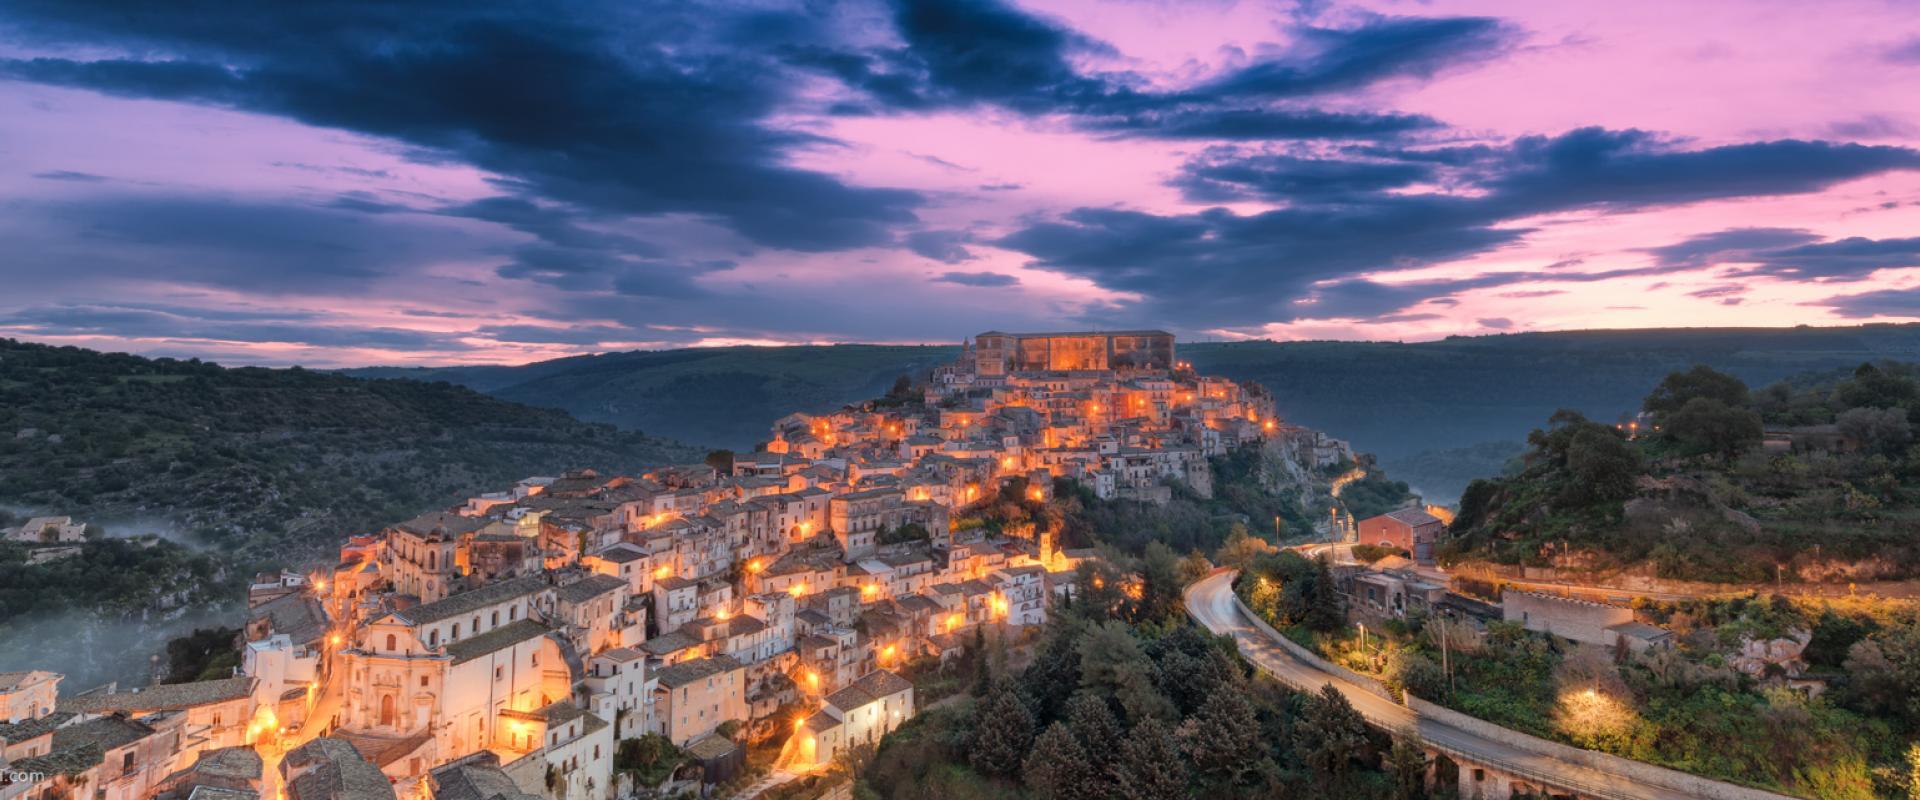 Visit of Ragusa Ibla